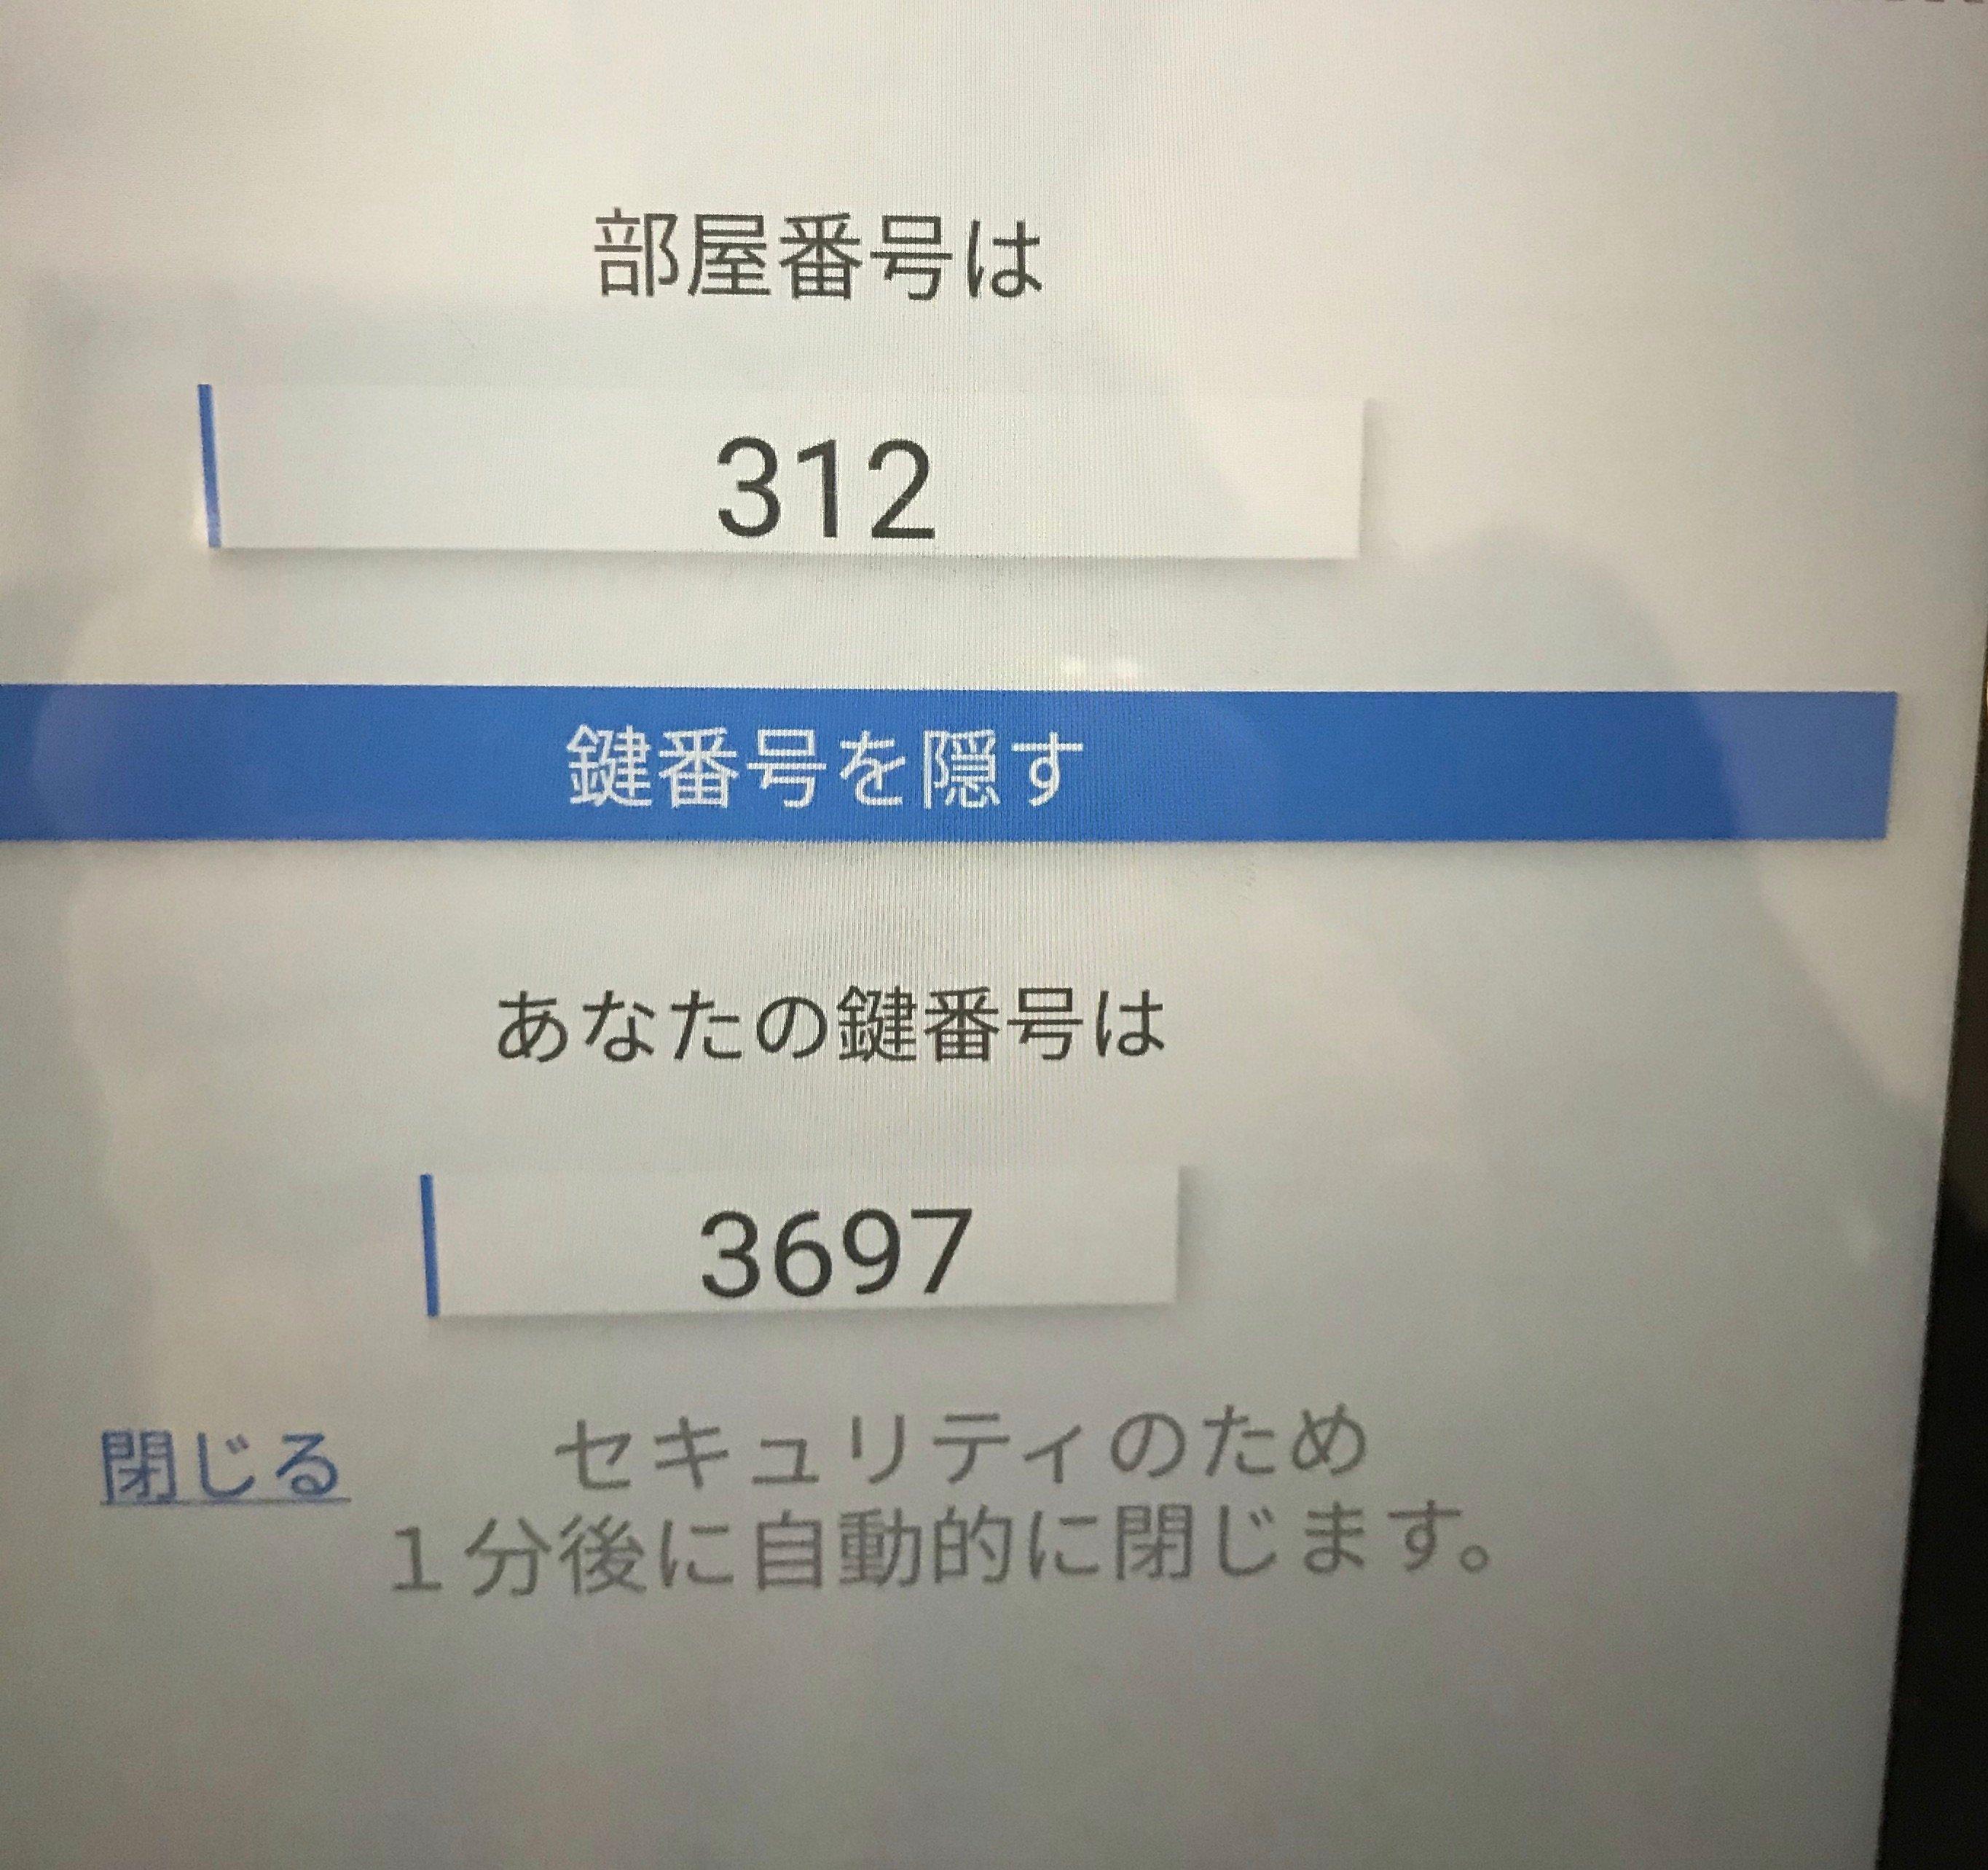 ABFEEA09-0B2F-459F-9C6A-51A47D0DE089_1_201_a